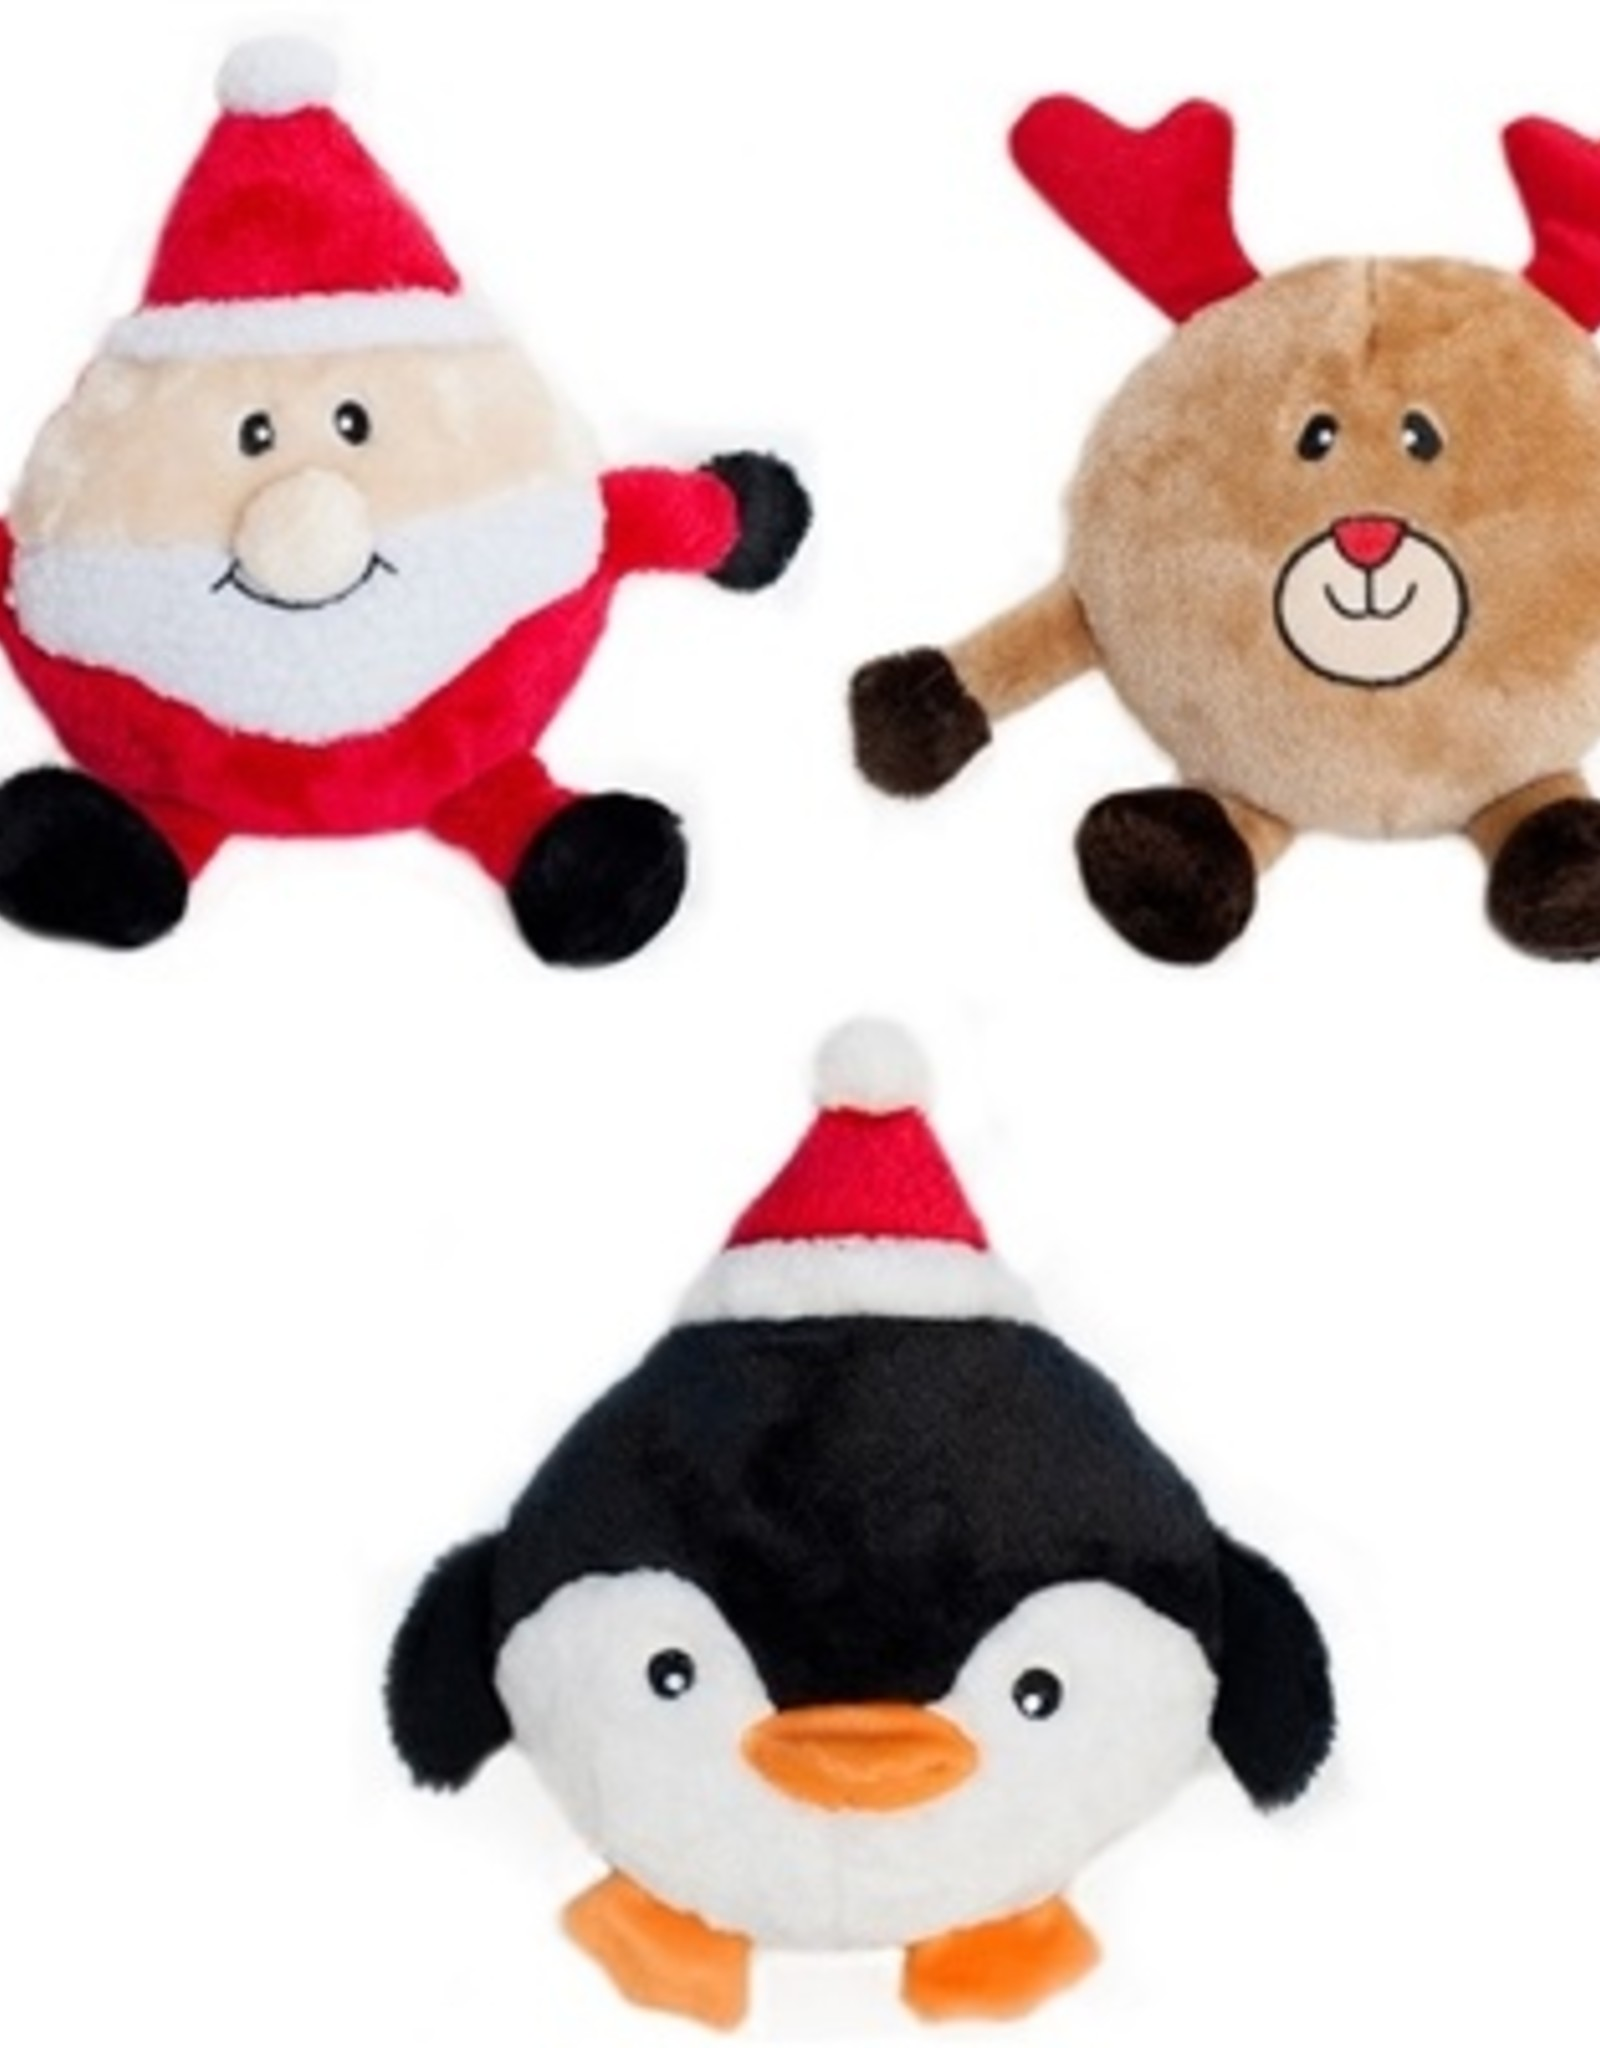 ZippyPaws ZippyPaws Holiday Brainey Reindeer